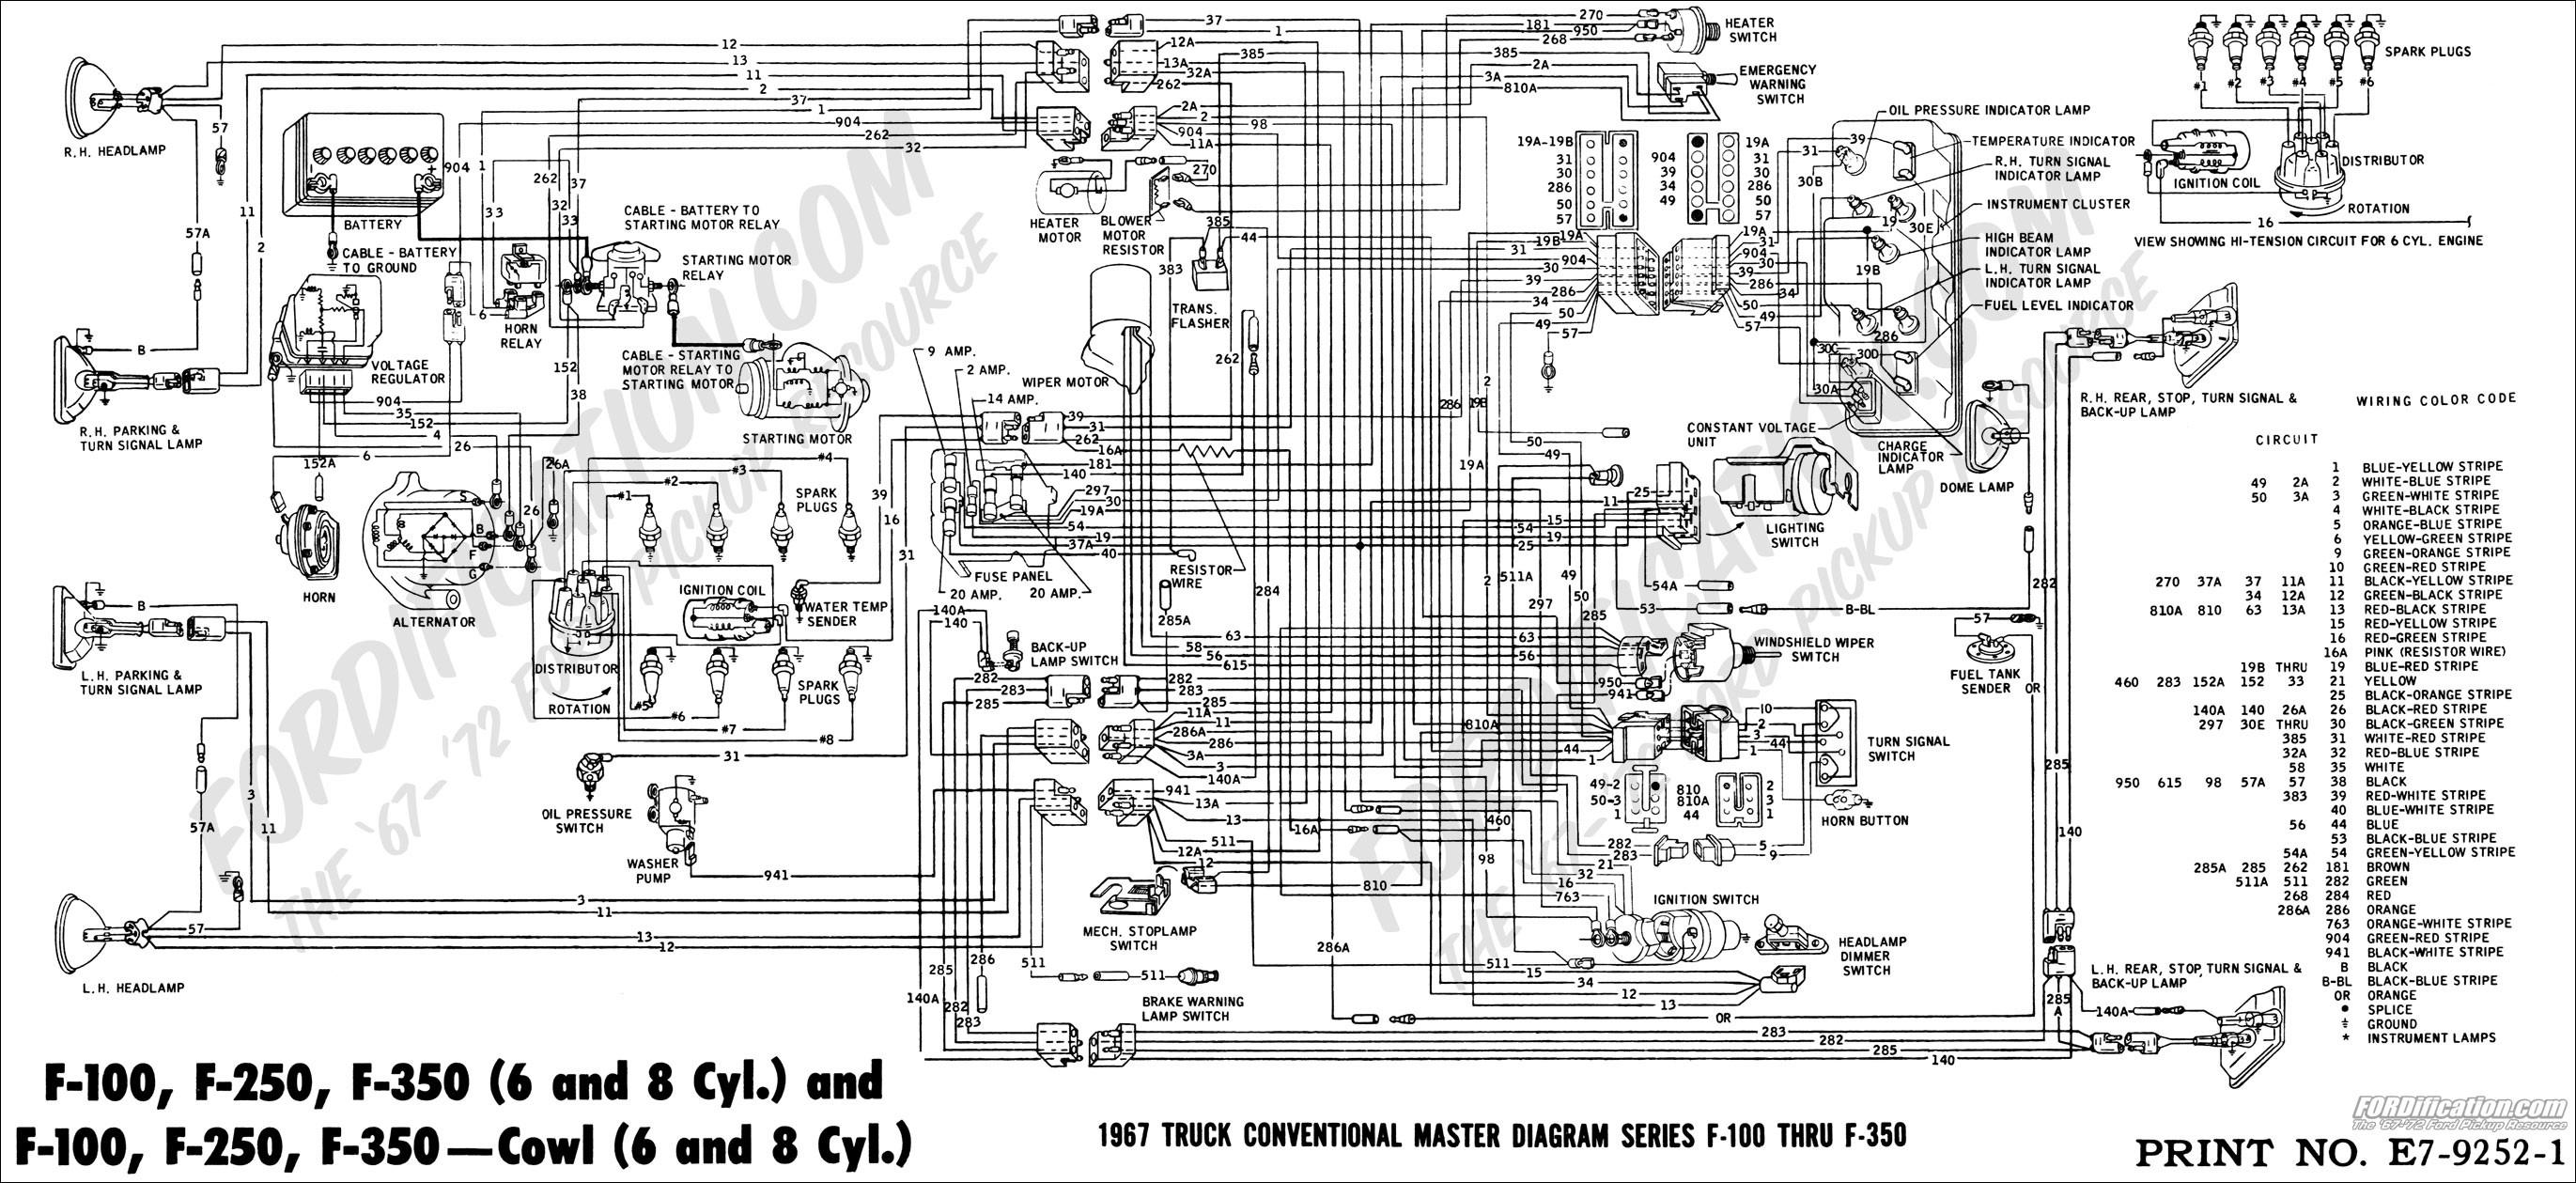 2007 ford Mustang Wiring Diagram 2007 ford Ranger Wiring Diagram Canopi Of 2007 ford Mustang Wiring Diagram